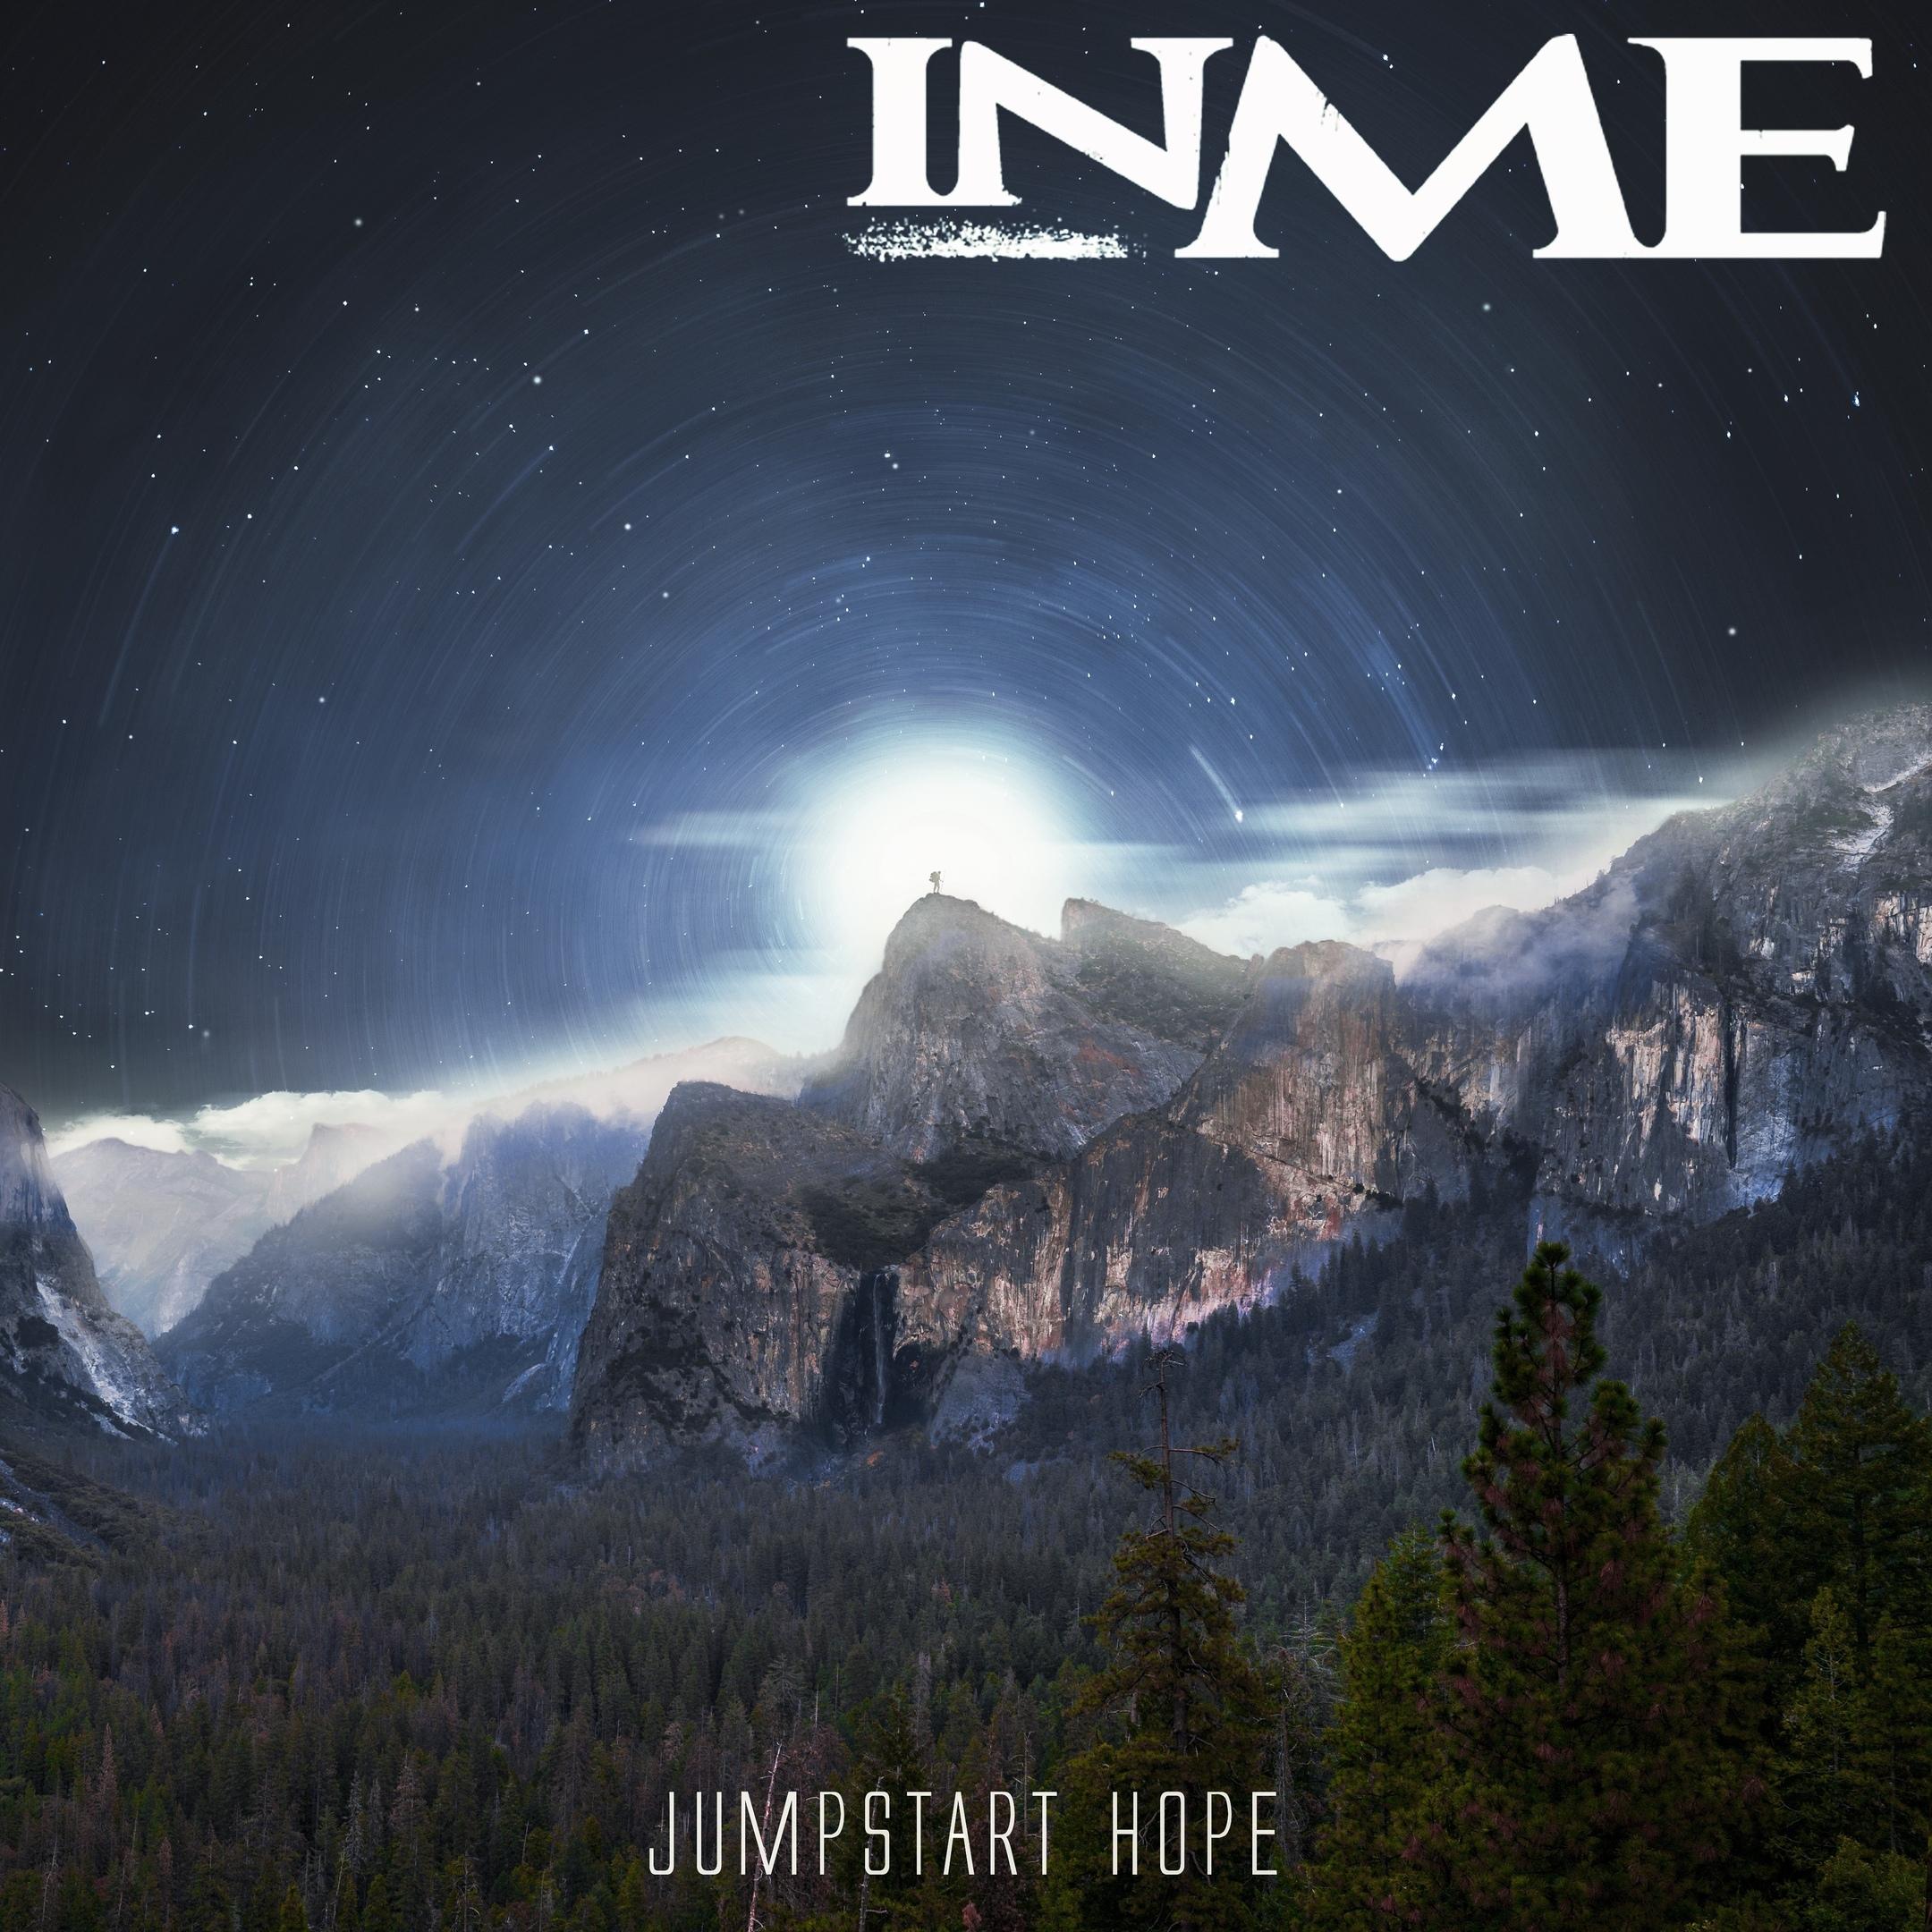 InMe - Jumpstart Hope